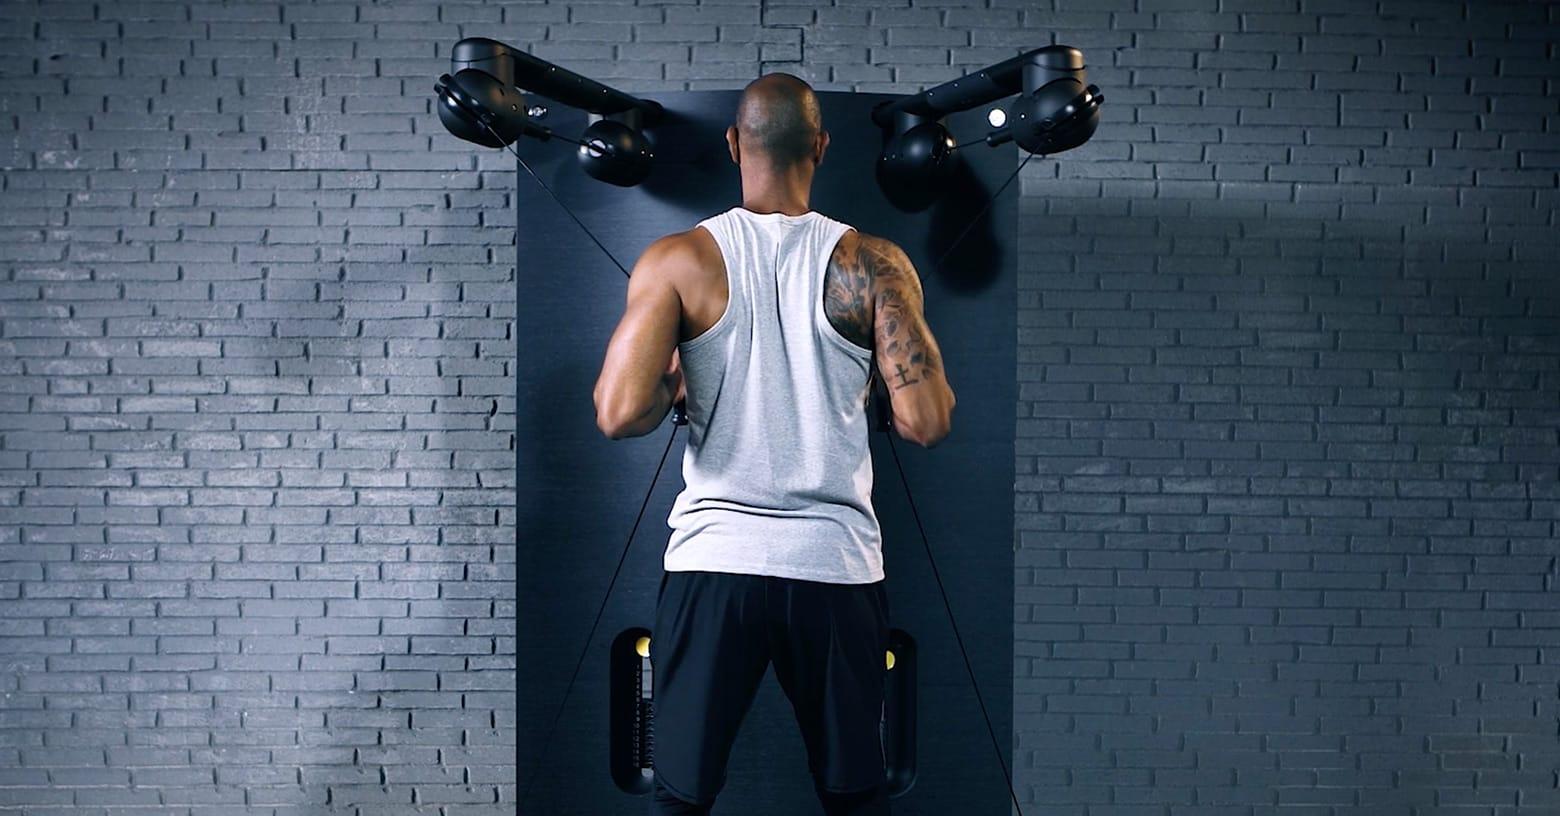 kinesis row - Kinesis-Rudern - Rame sur Kinesis - EVO Fitness